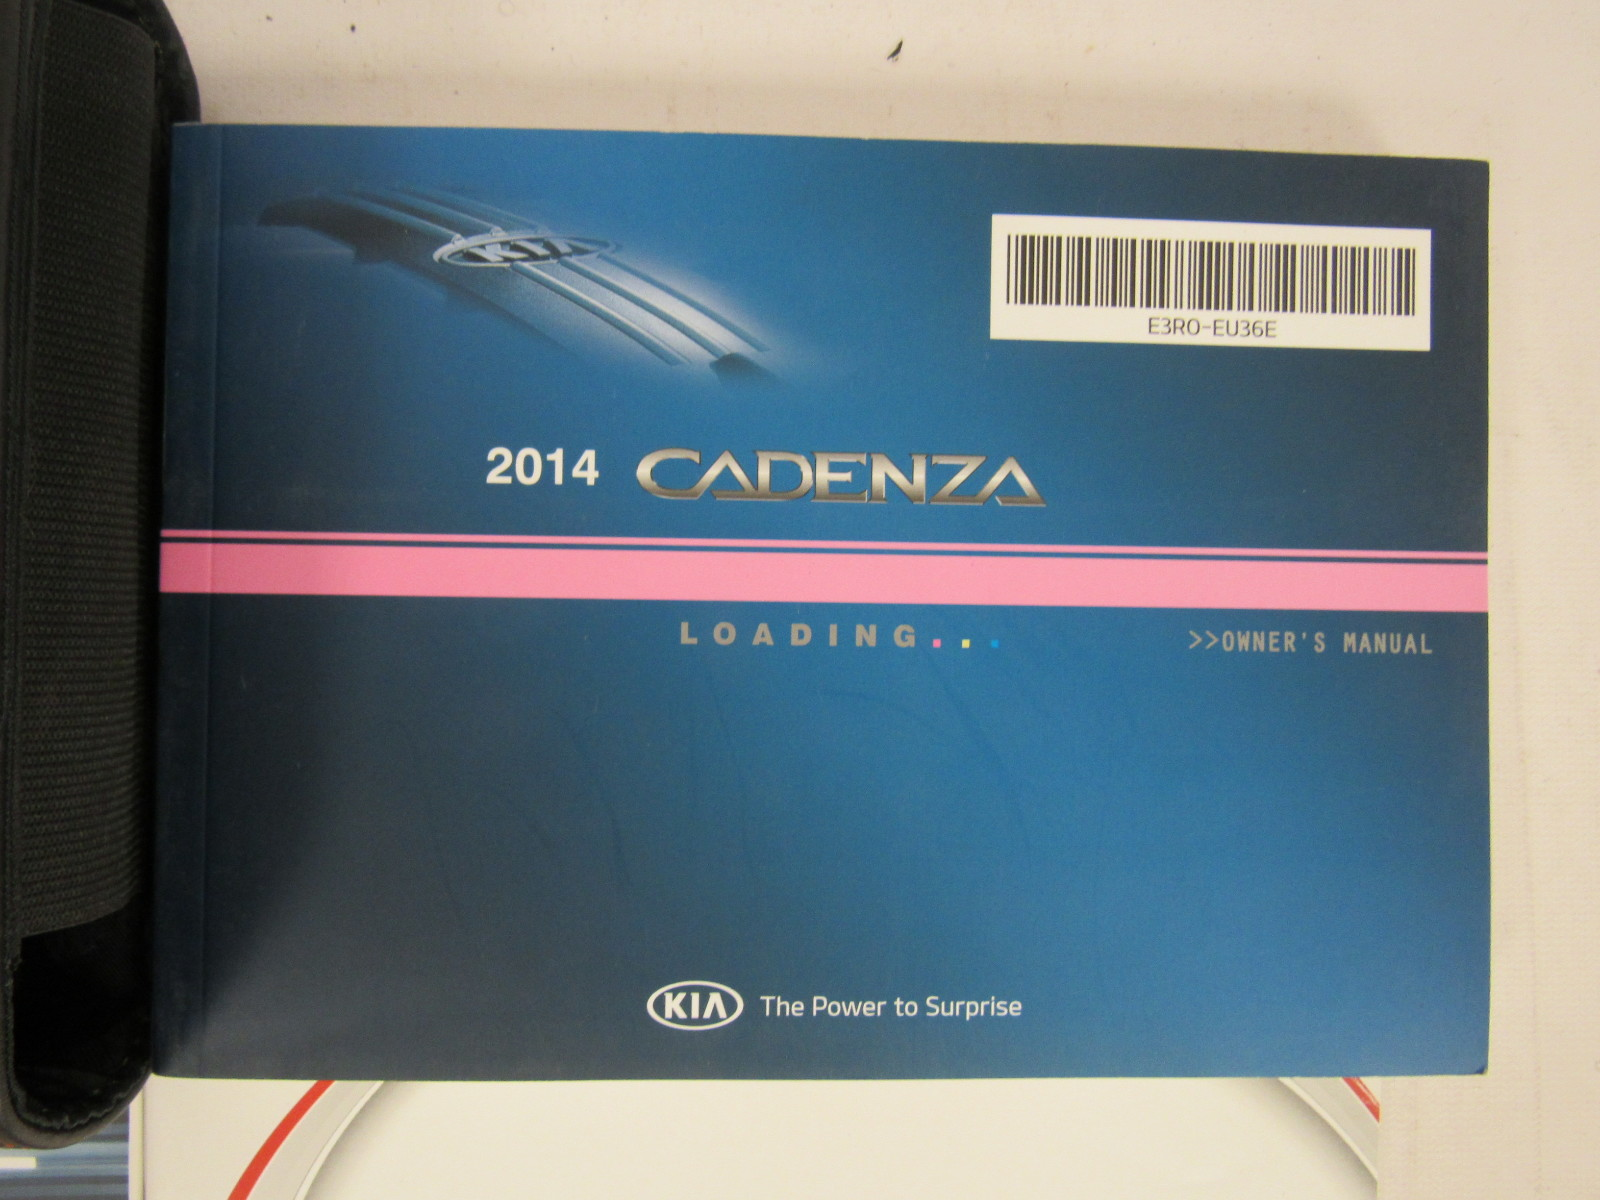 2014 kia cadenza owners manual book bashful yak rh bashfulyak com 2014 cadenza owners manual 2017 kia cadenza owners manual